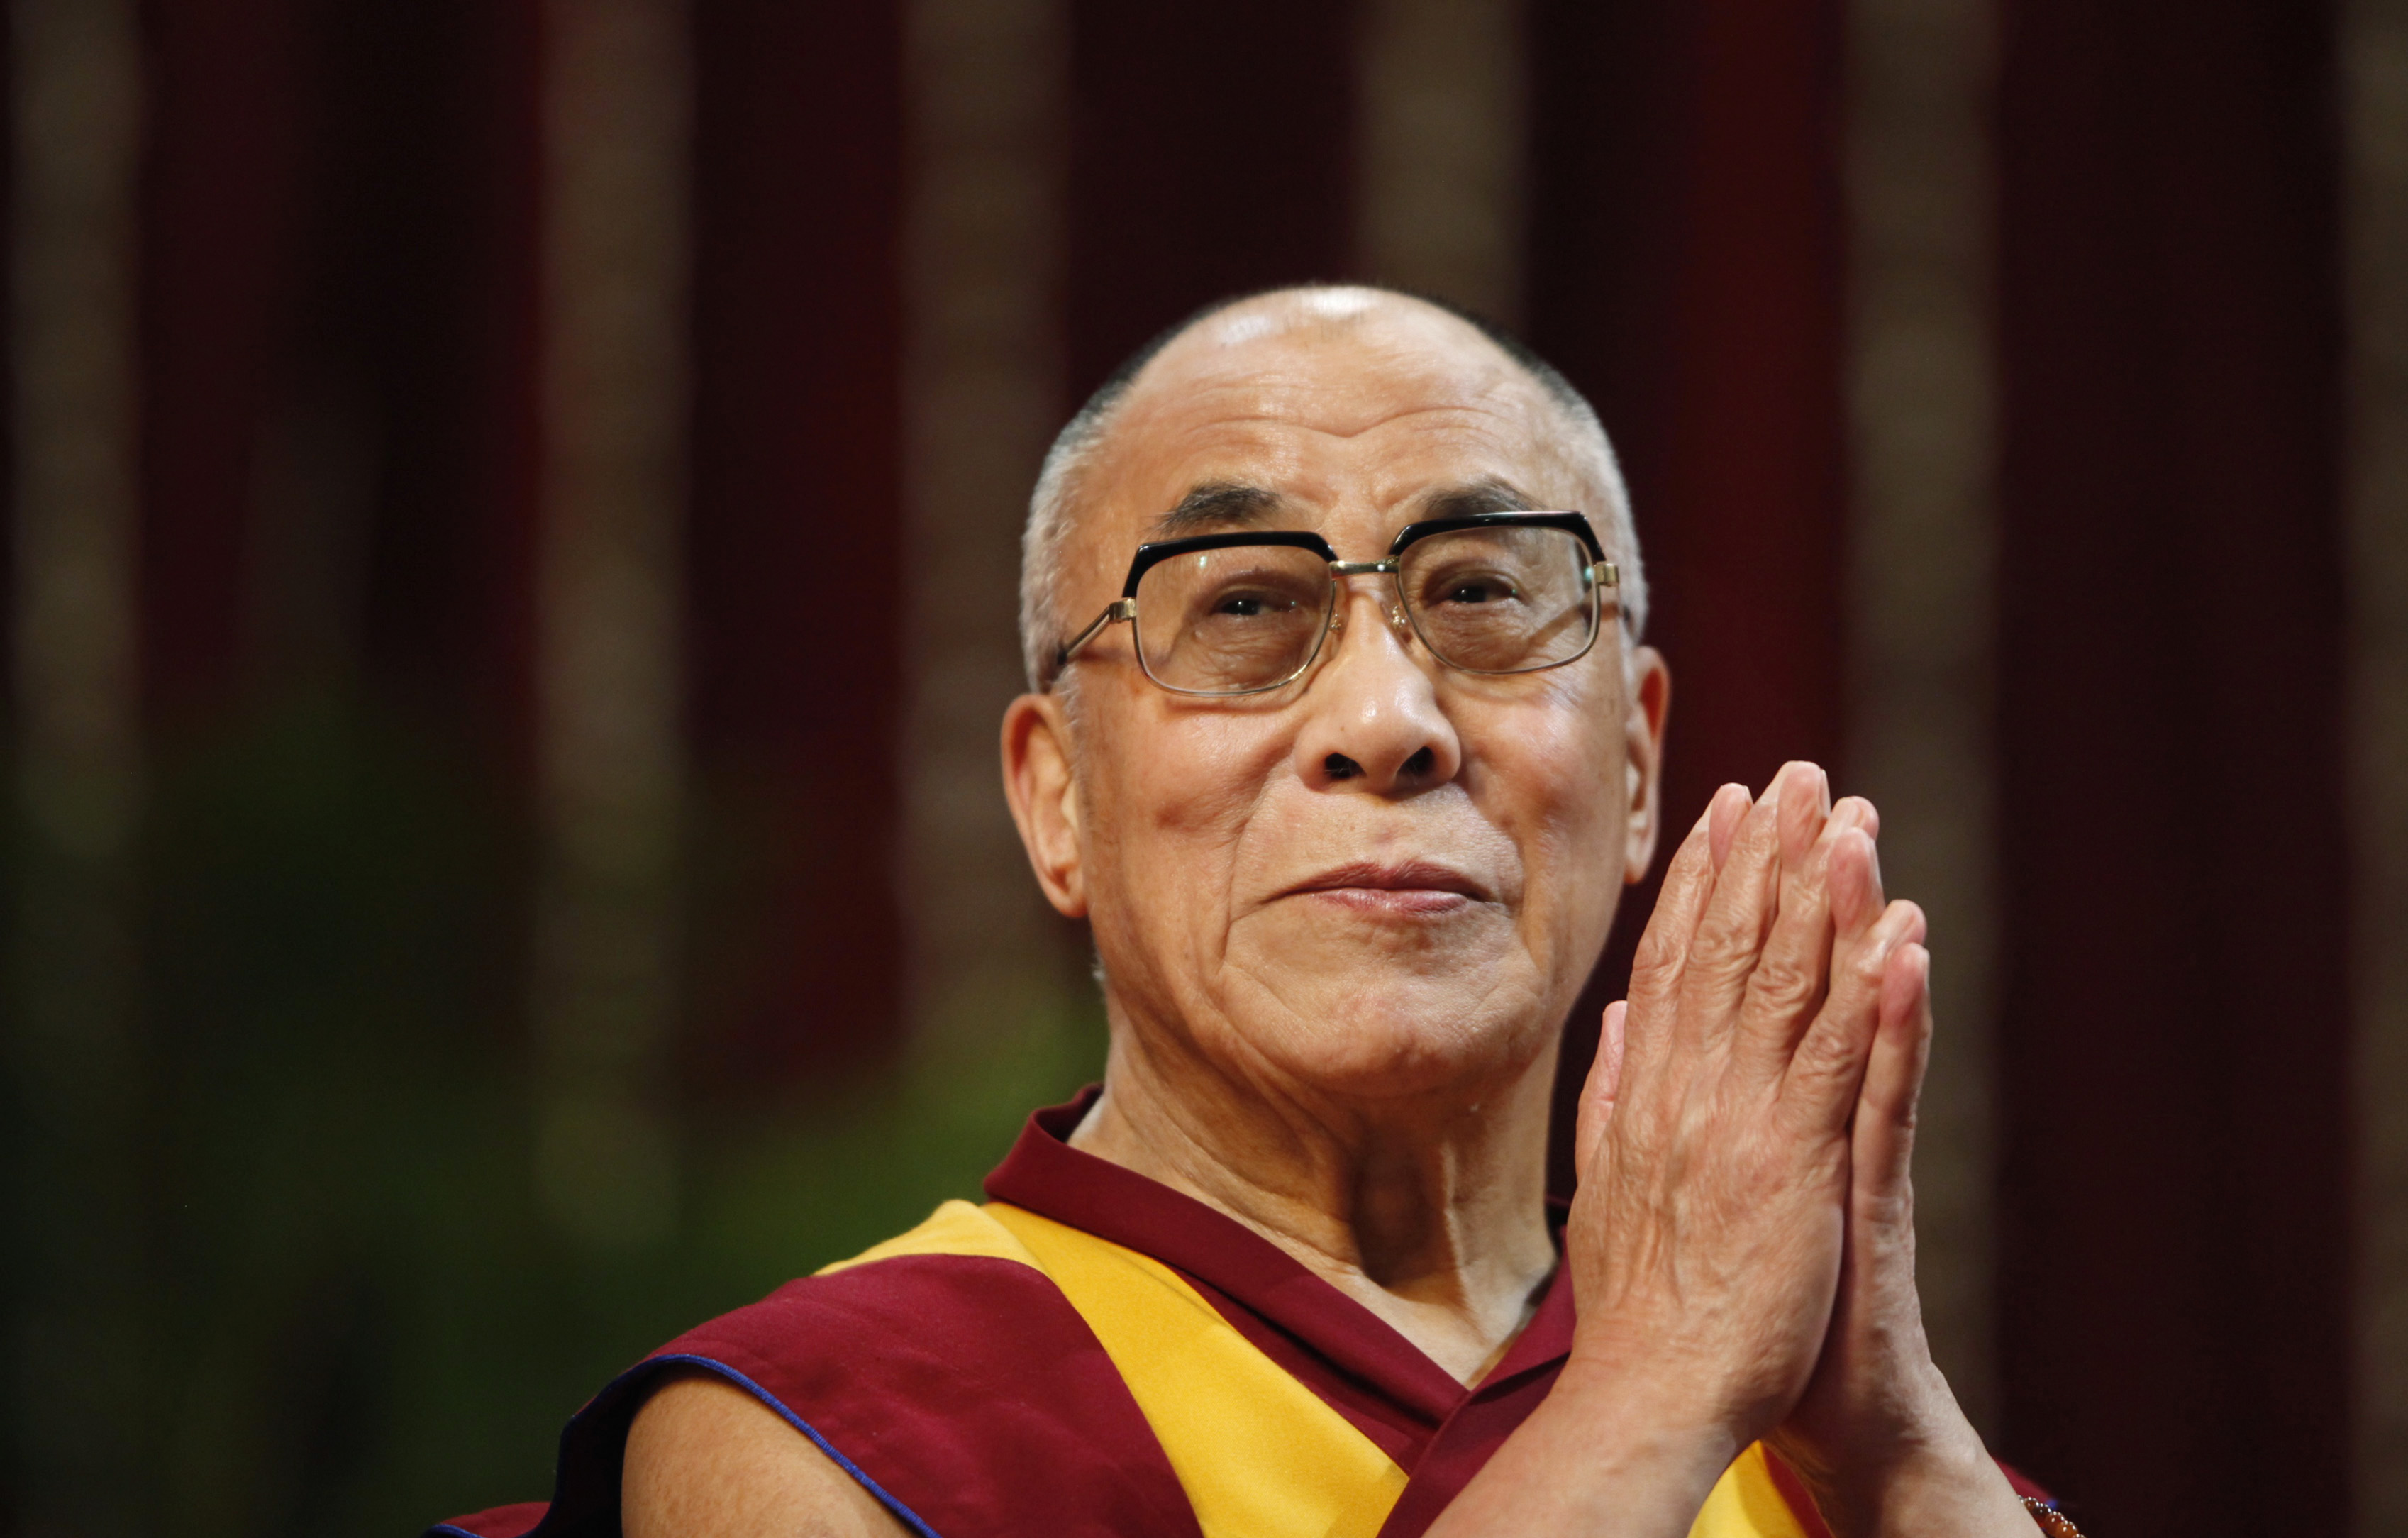 China condemns 'Dalai Lama' app as splittist political move